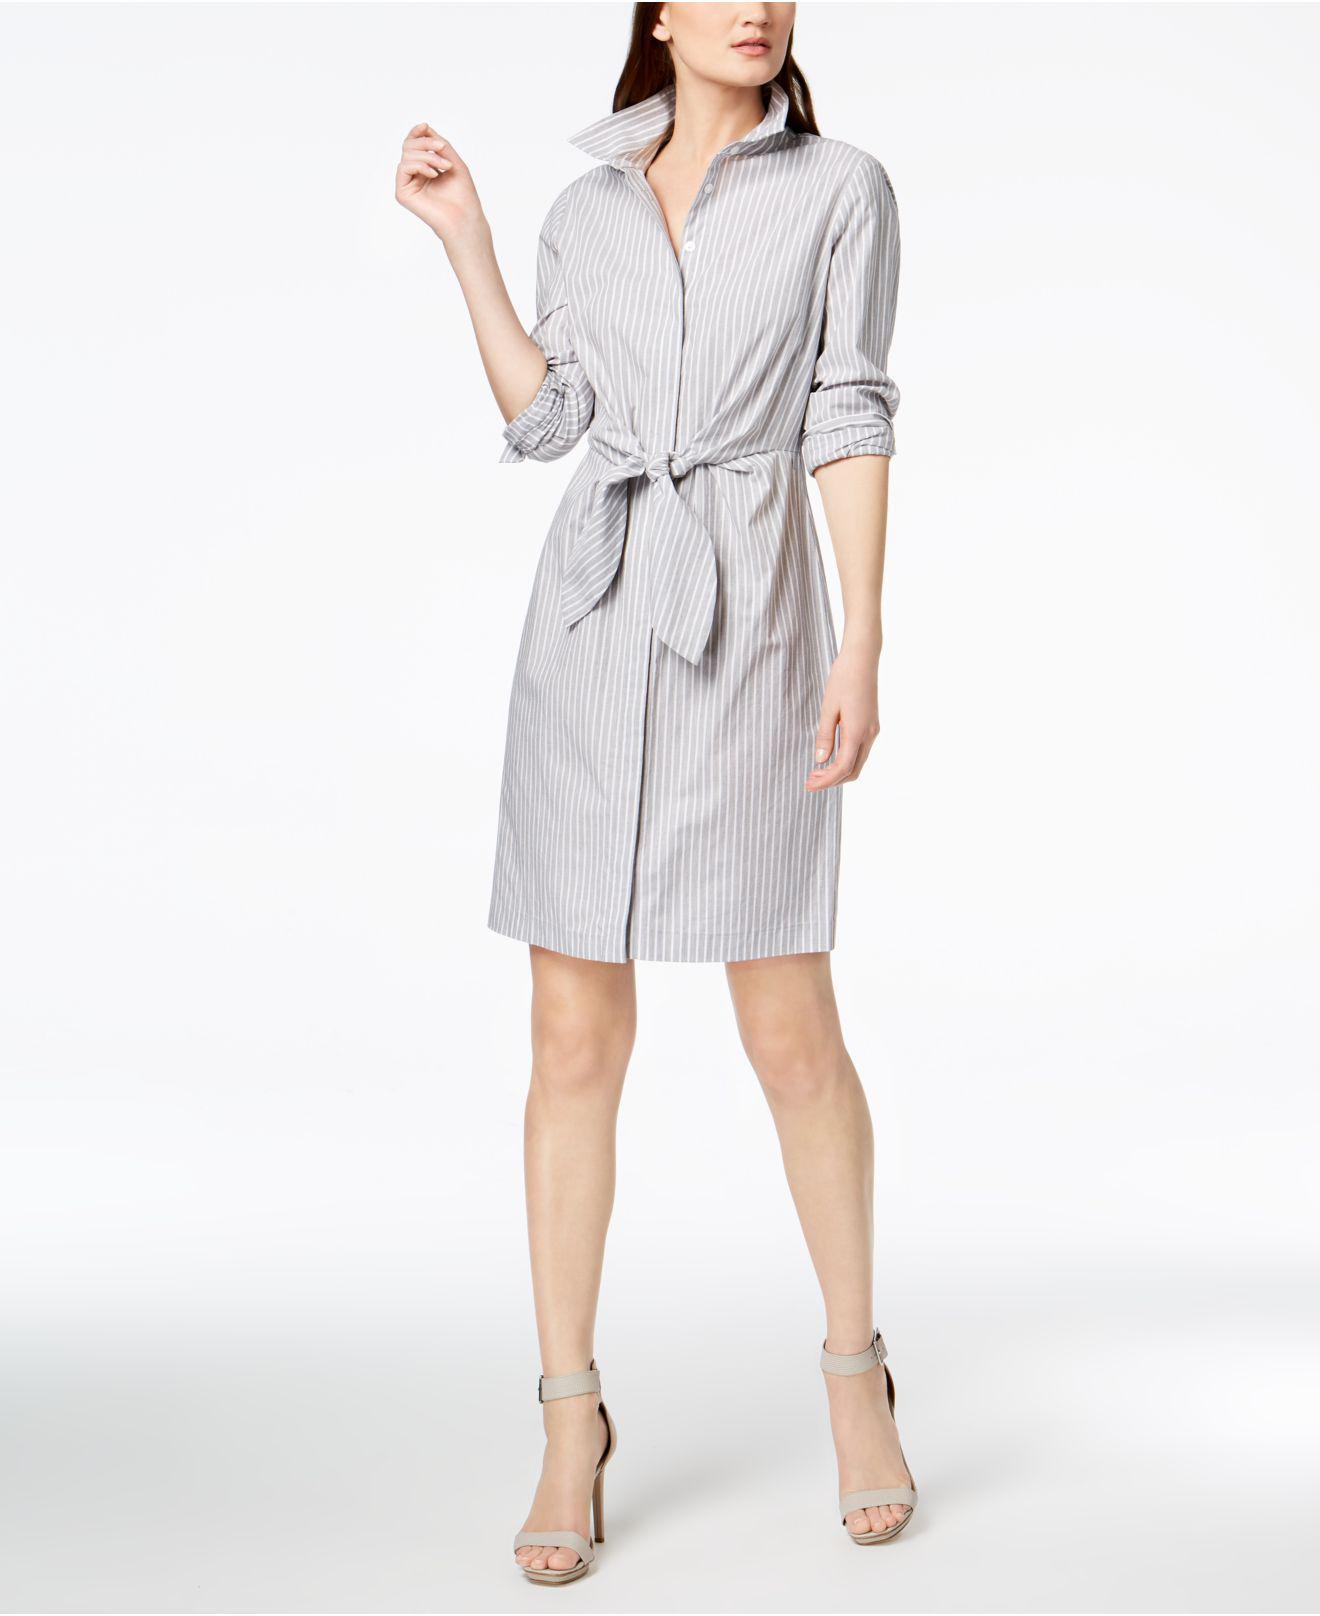 Striped cotton shirt dress CALVIN KLEIN 205W39NYC 30VVVp9p